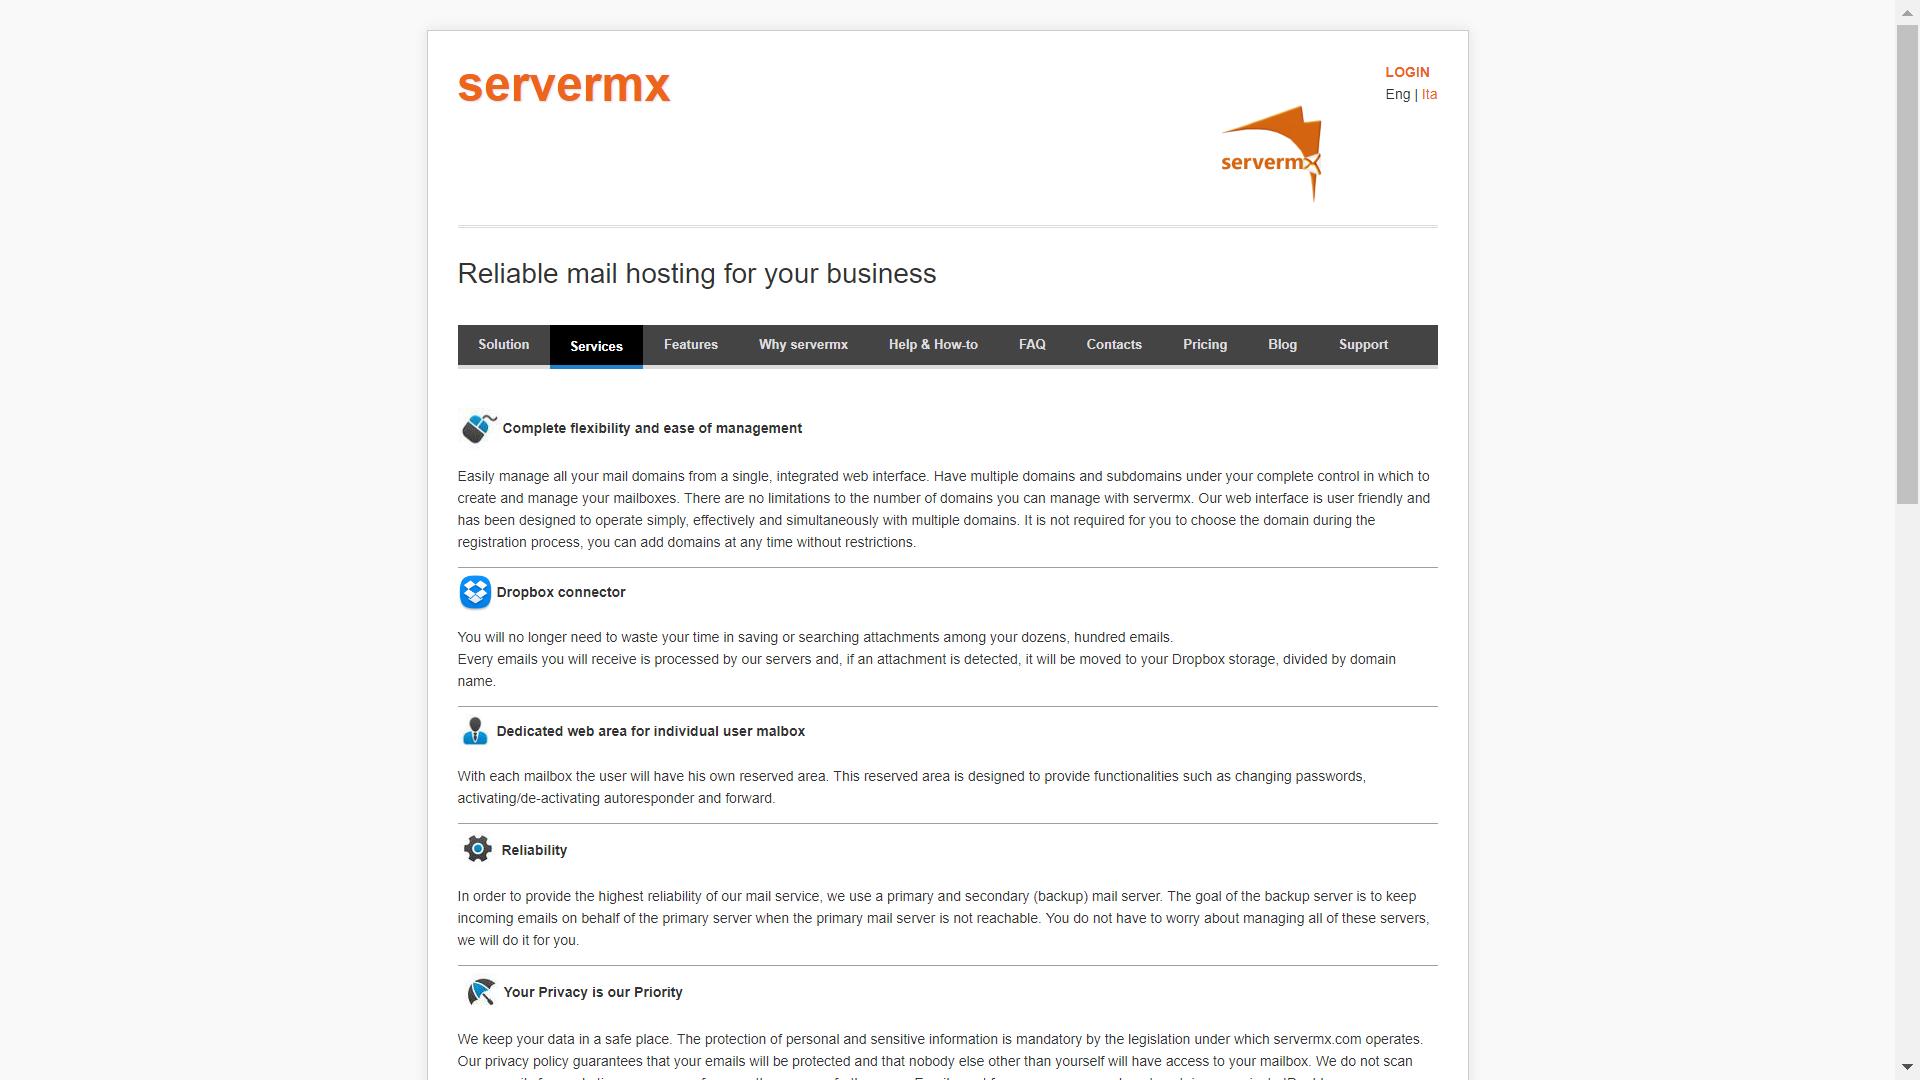 Servermx Reviews 2019: Details, Pricing, & Features | G2